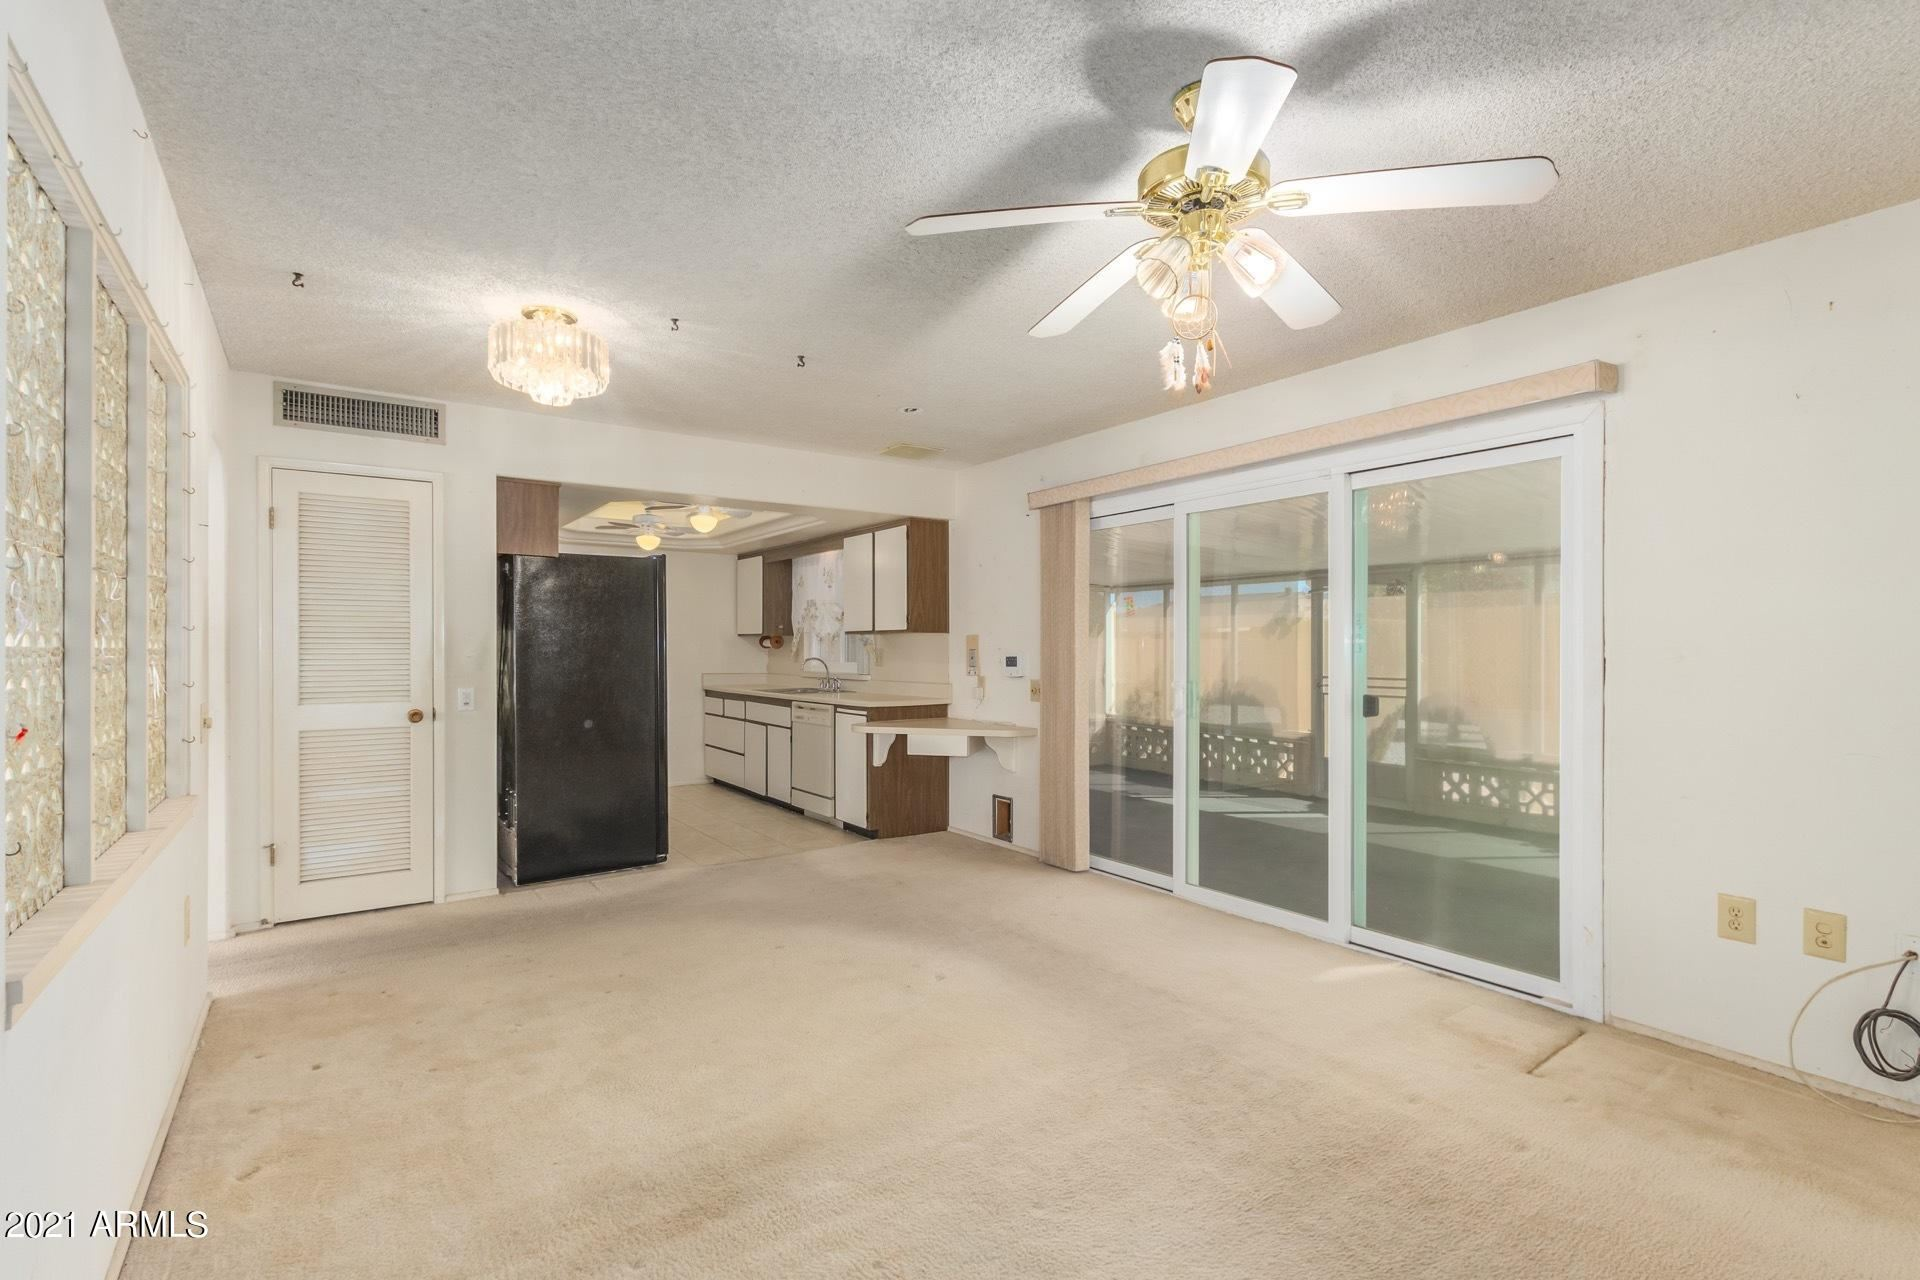 Photo of 11071 W GULF HILLS Drive, Sun City, AZ 85351 (MLS # 6200803)